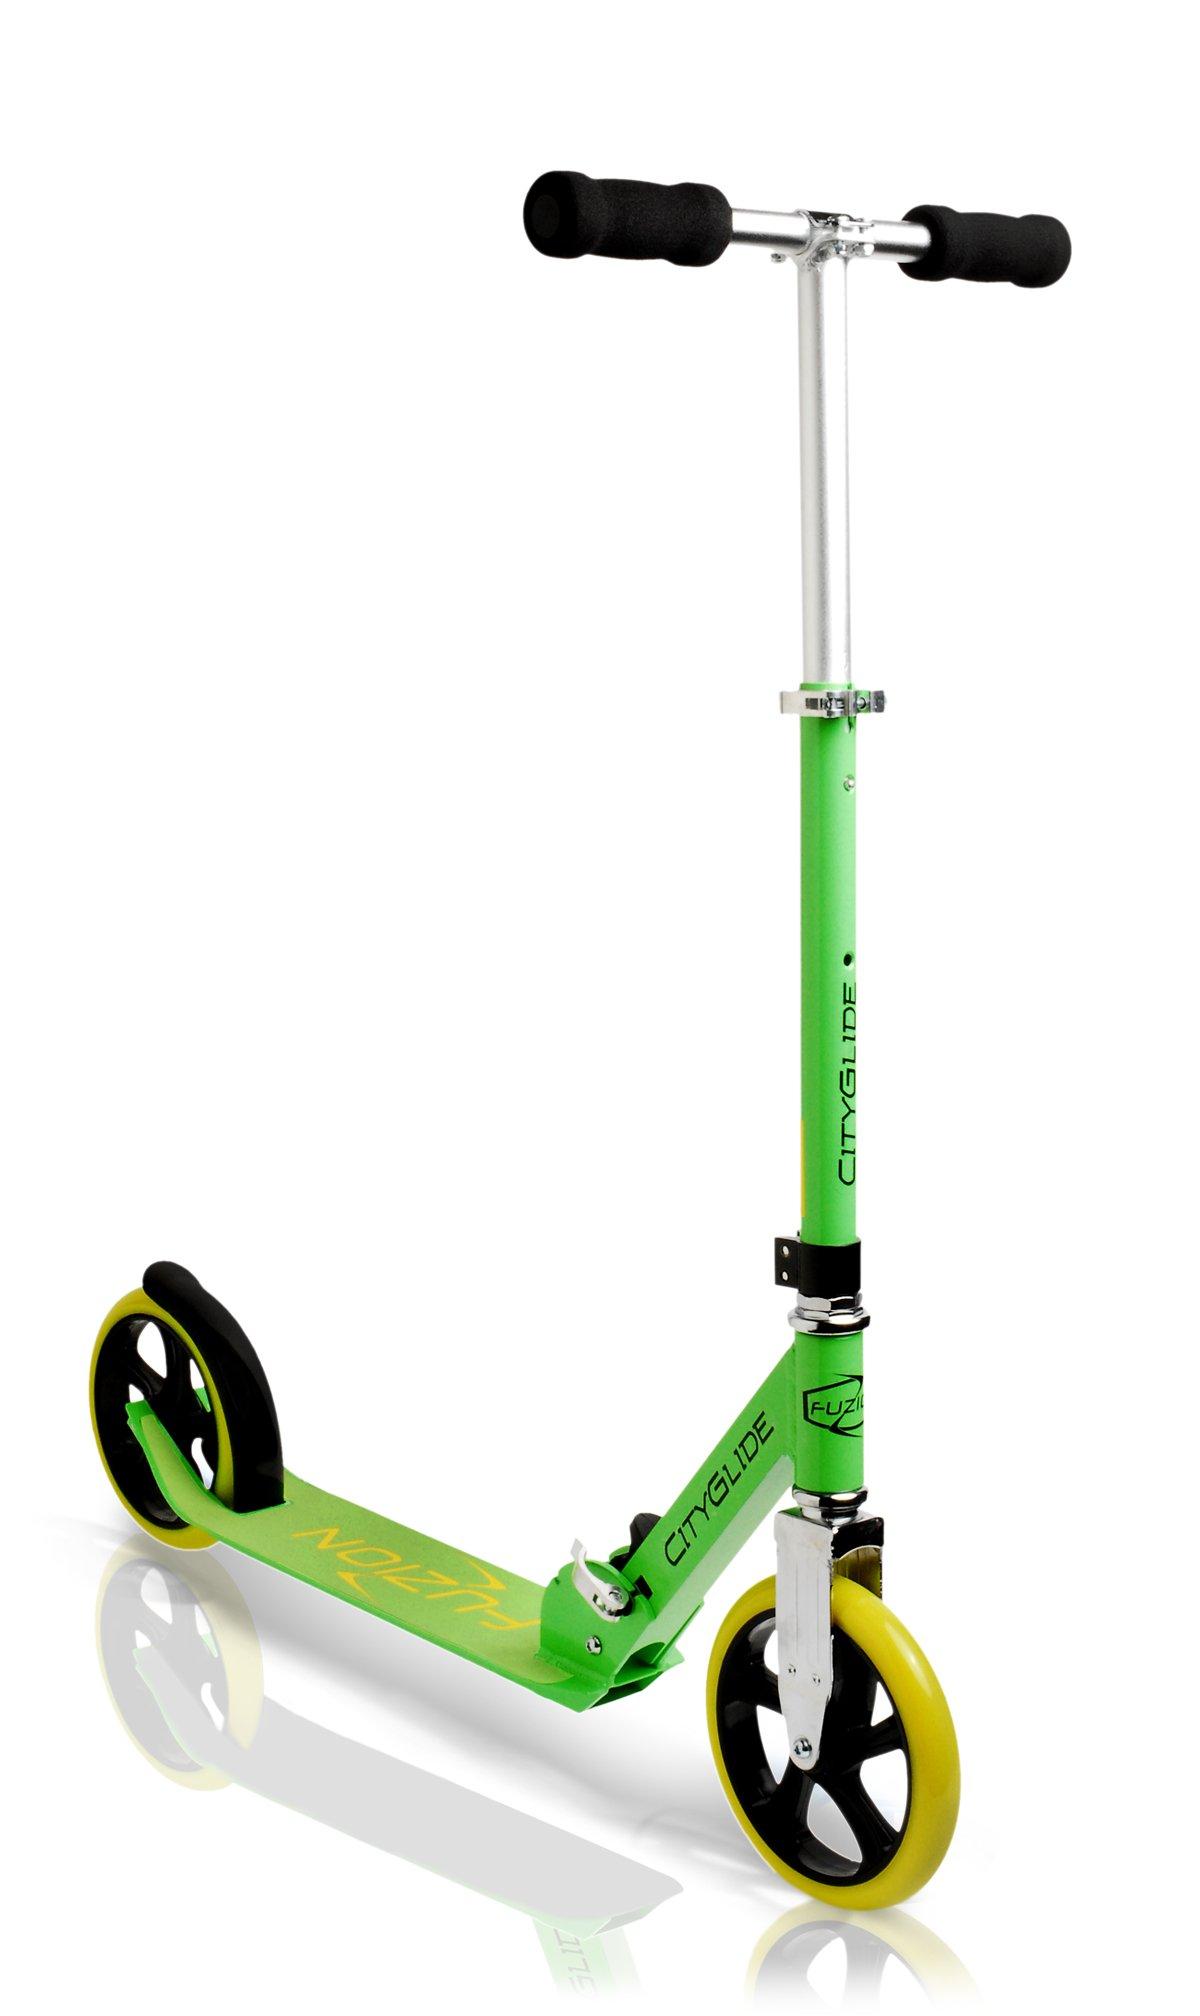 Fuzion Cityglide Adult Kick Scooter (Green) by Fuzion